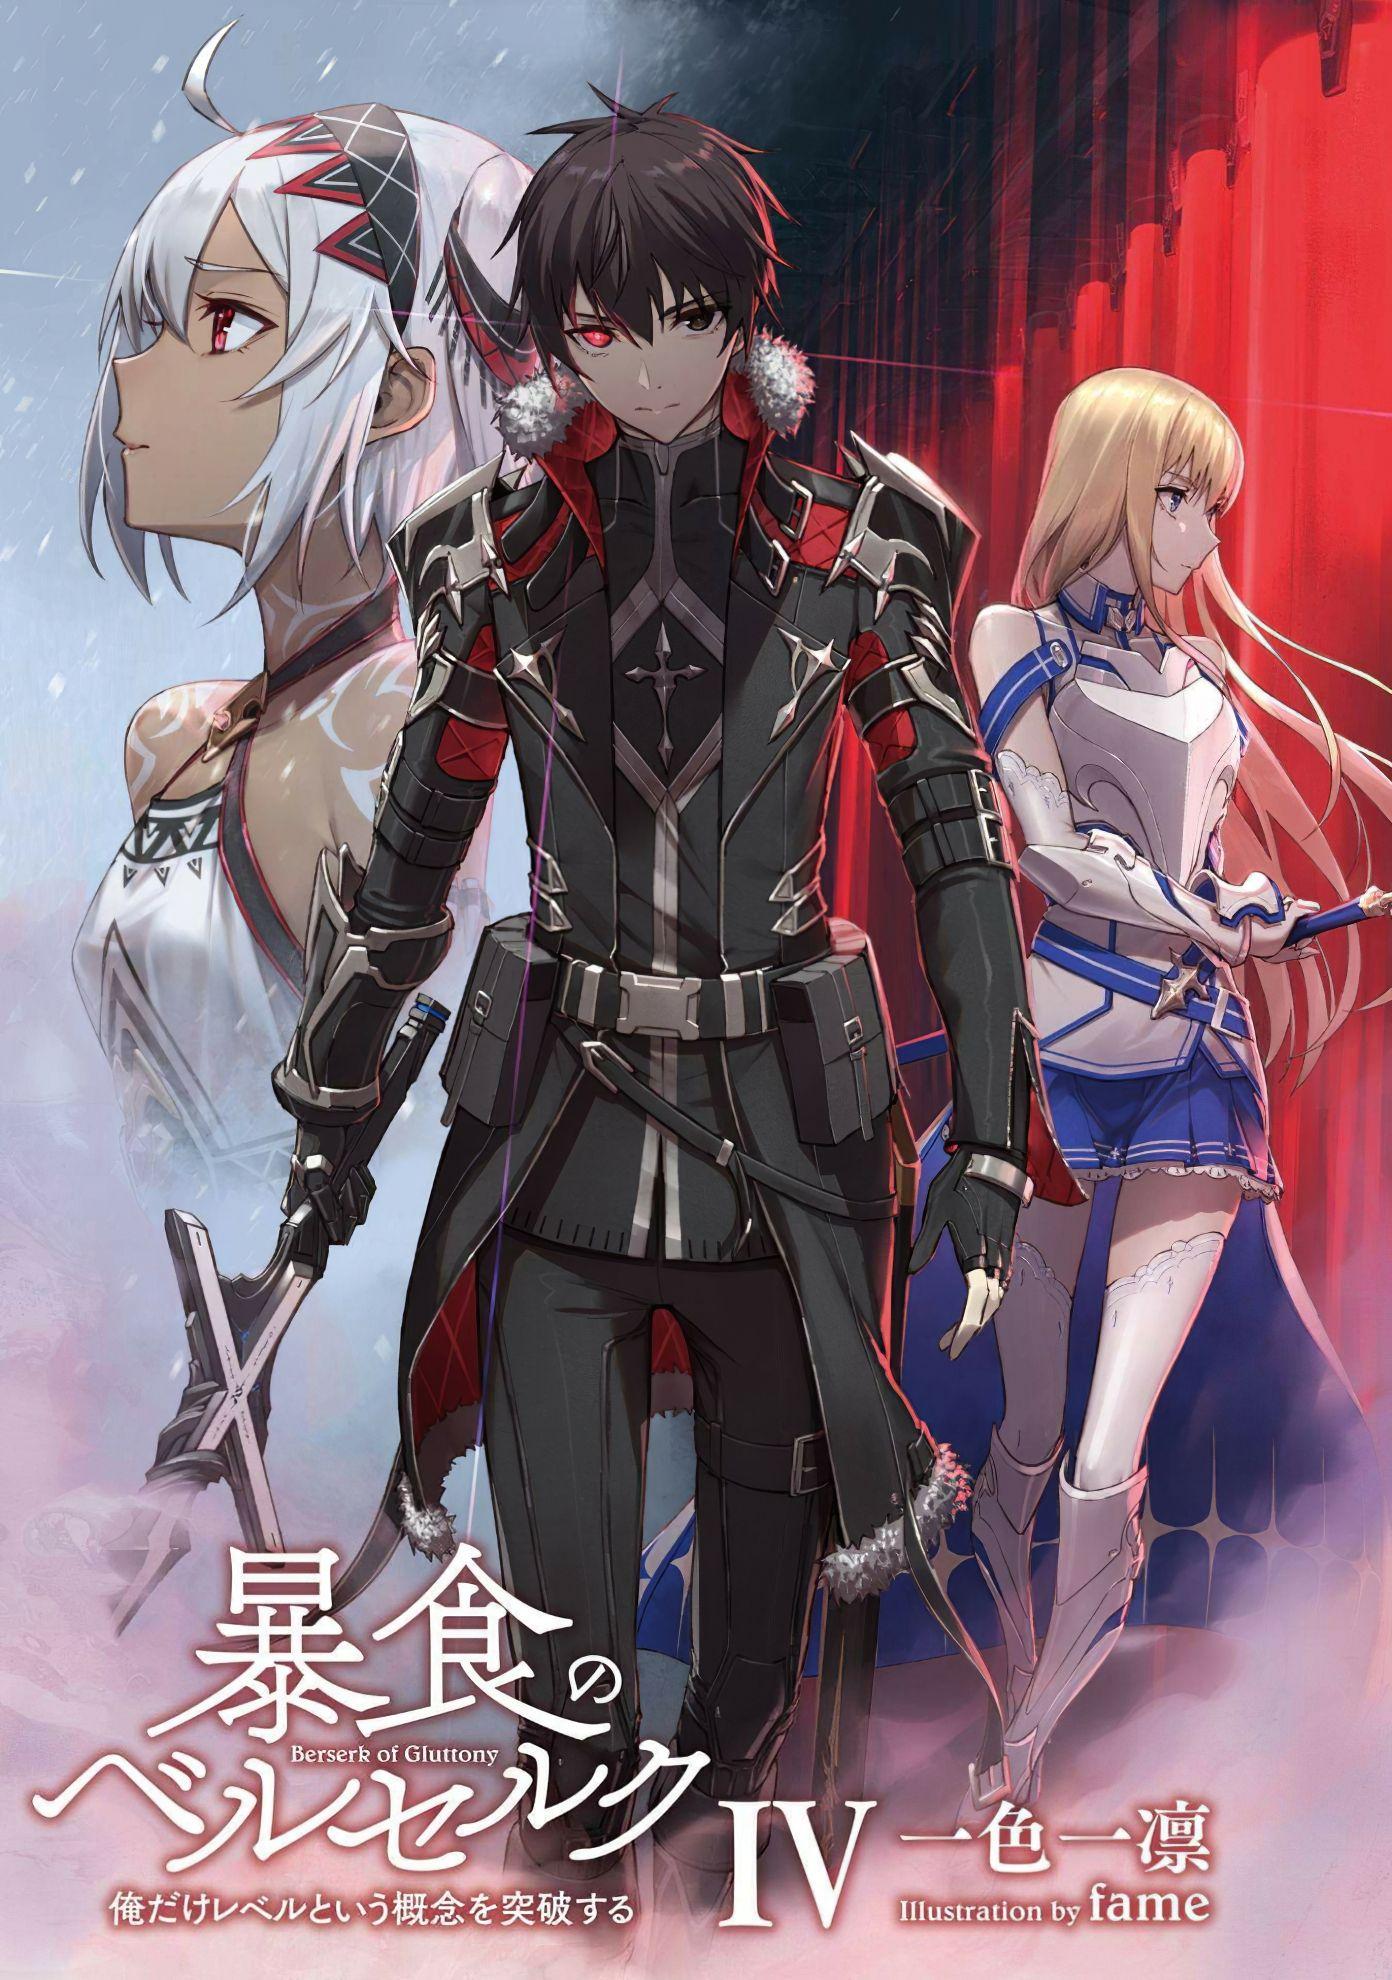 Pin By Justin Da King On Anime Art In 2020 Anime Anime